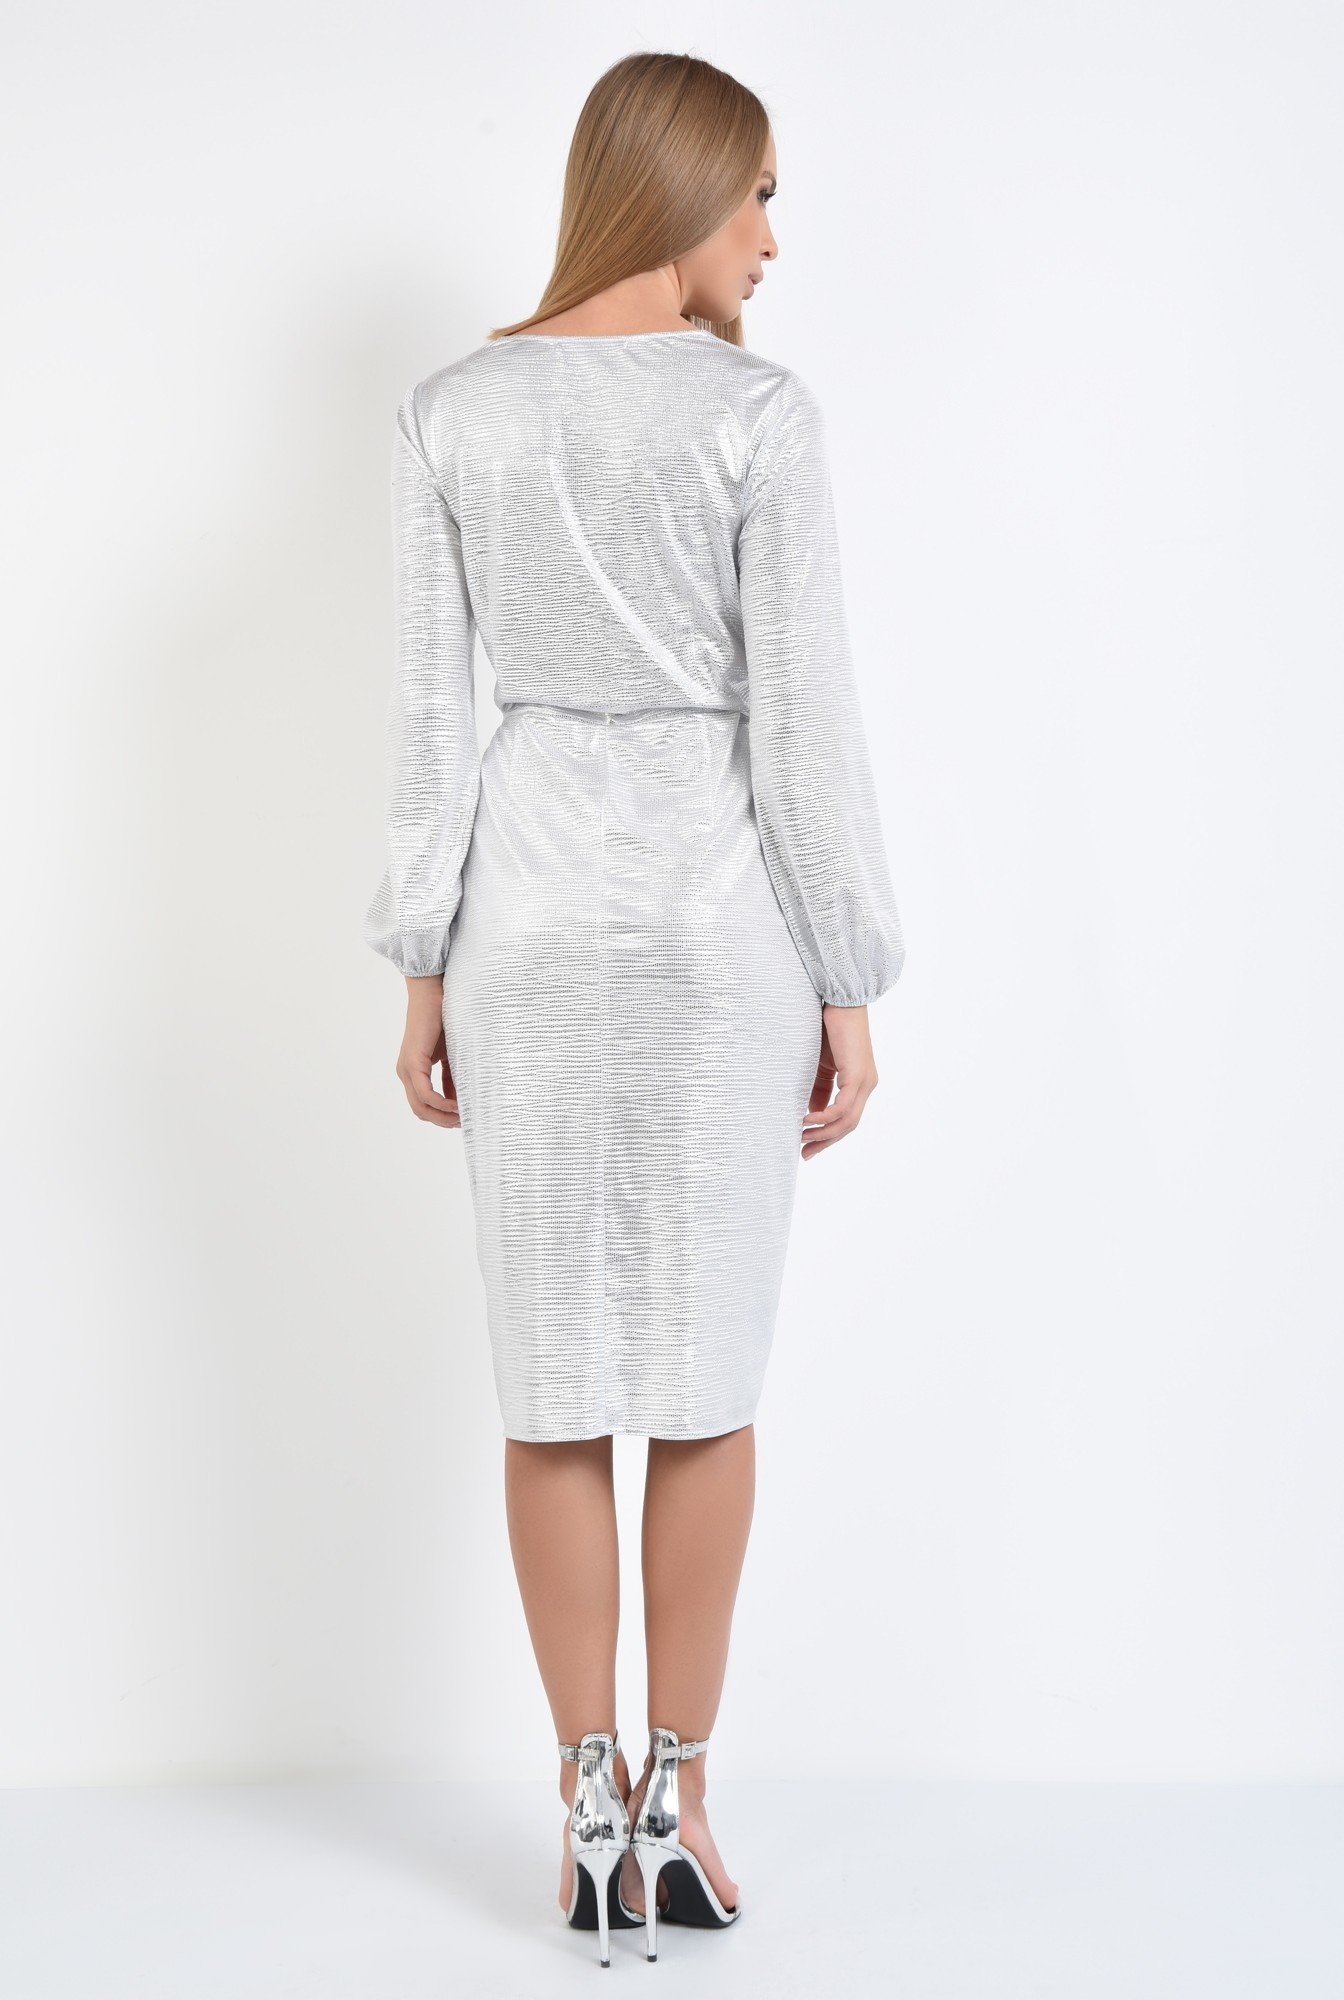 1 - rochie de seara, petrecuta, din lurex, argintie, drapata